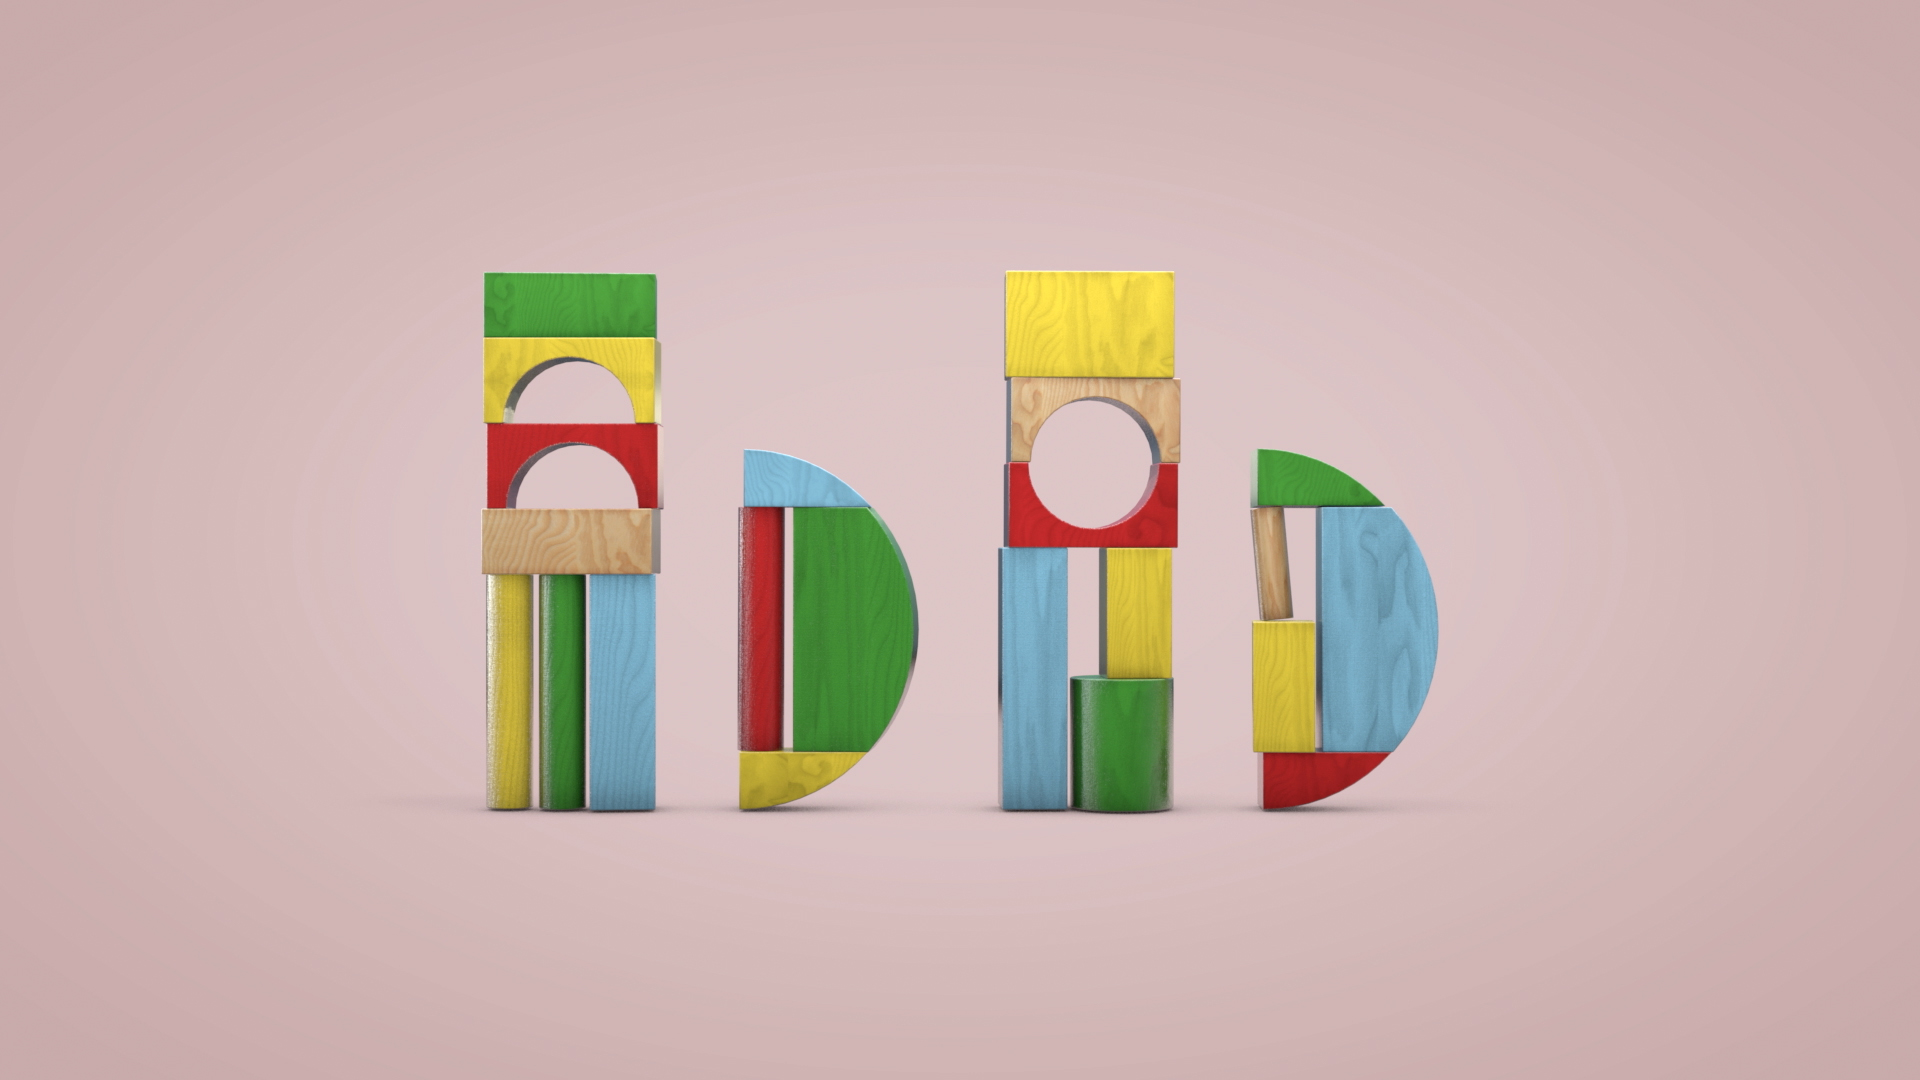 Bom Bom logo made of toy blocks